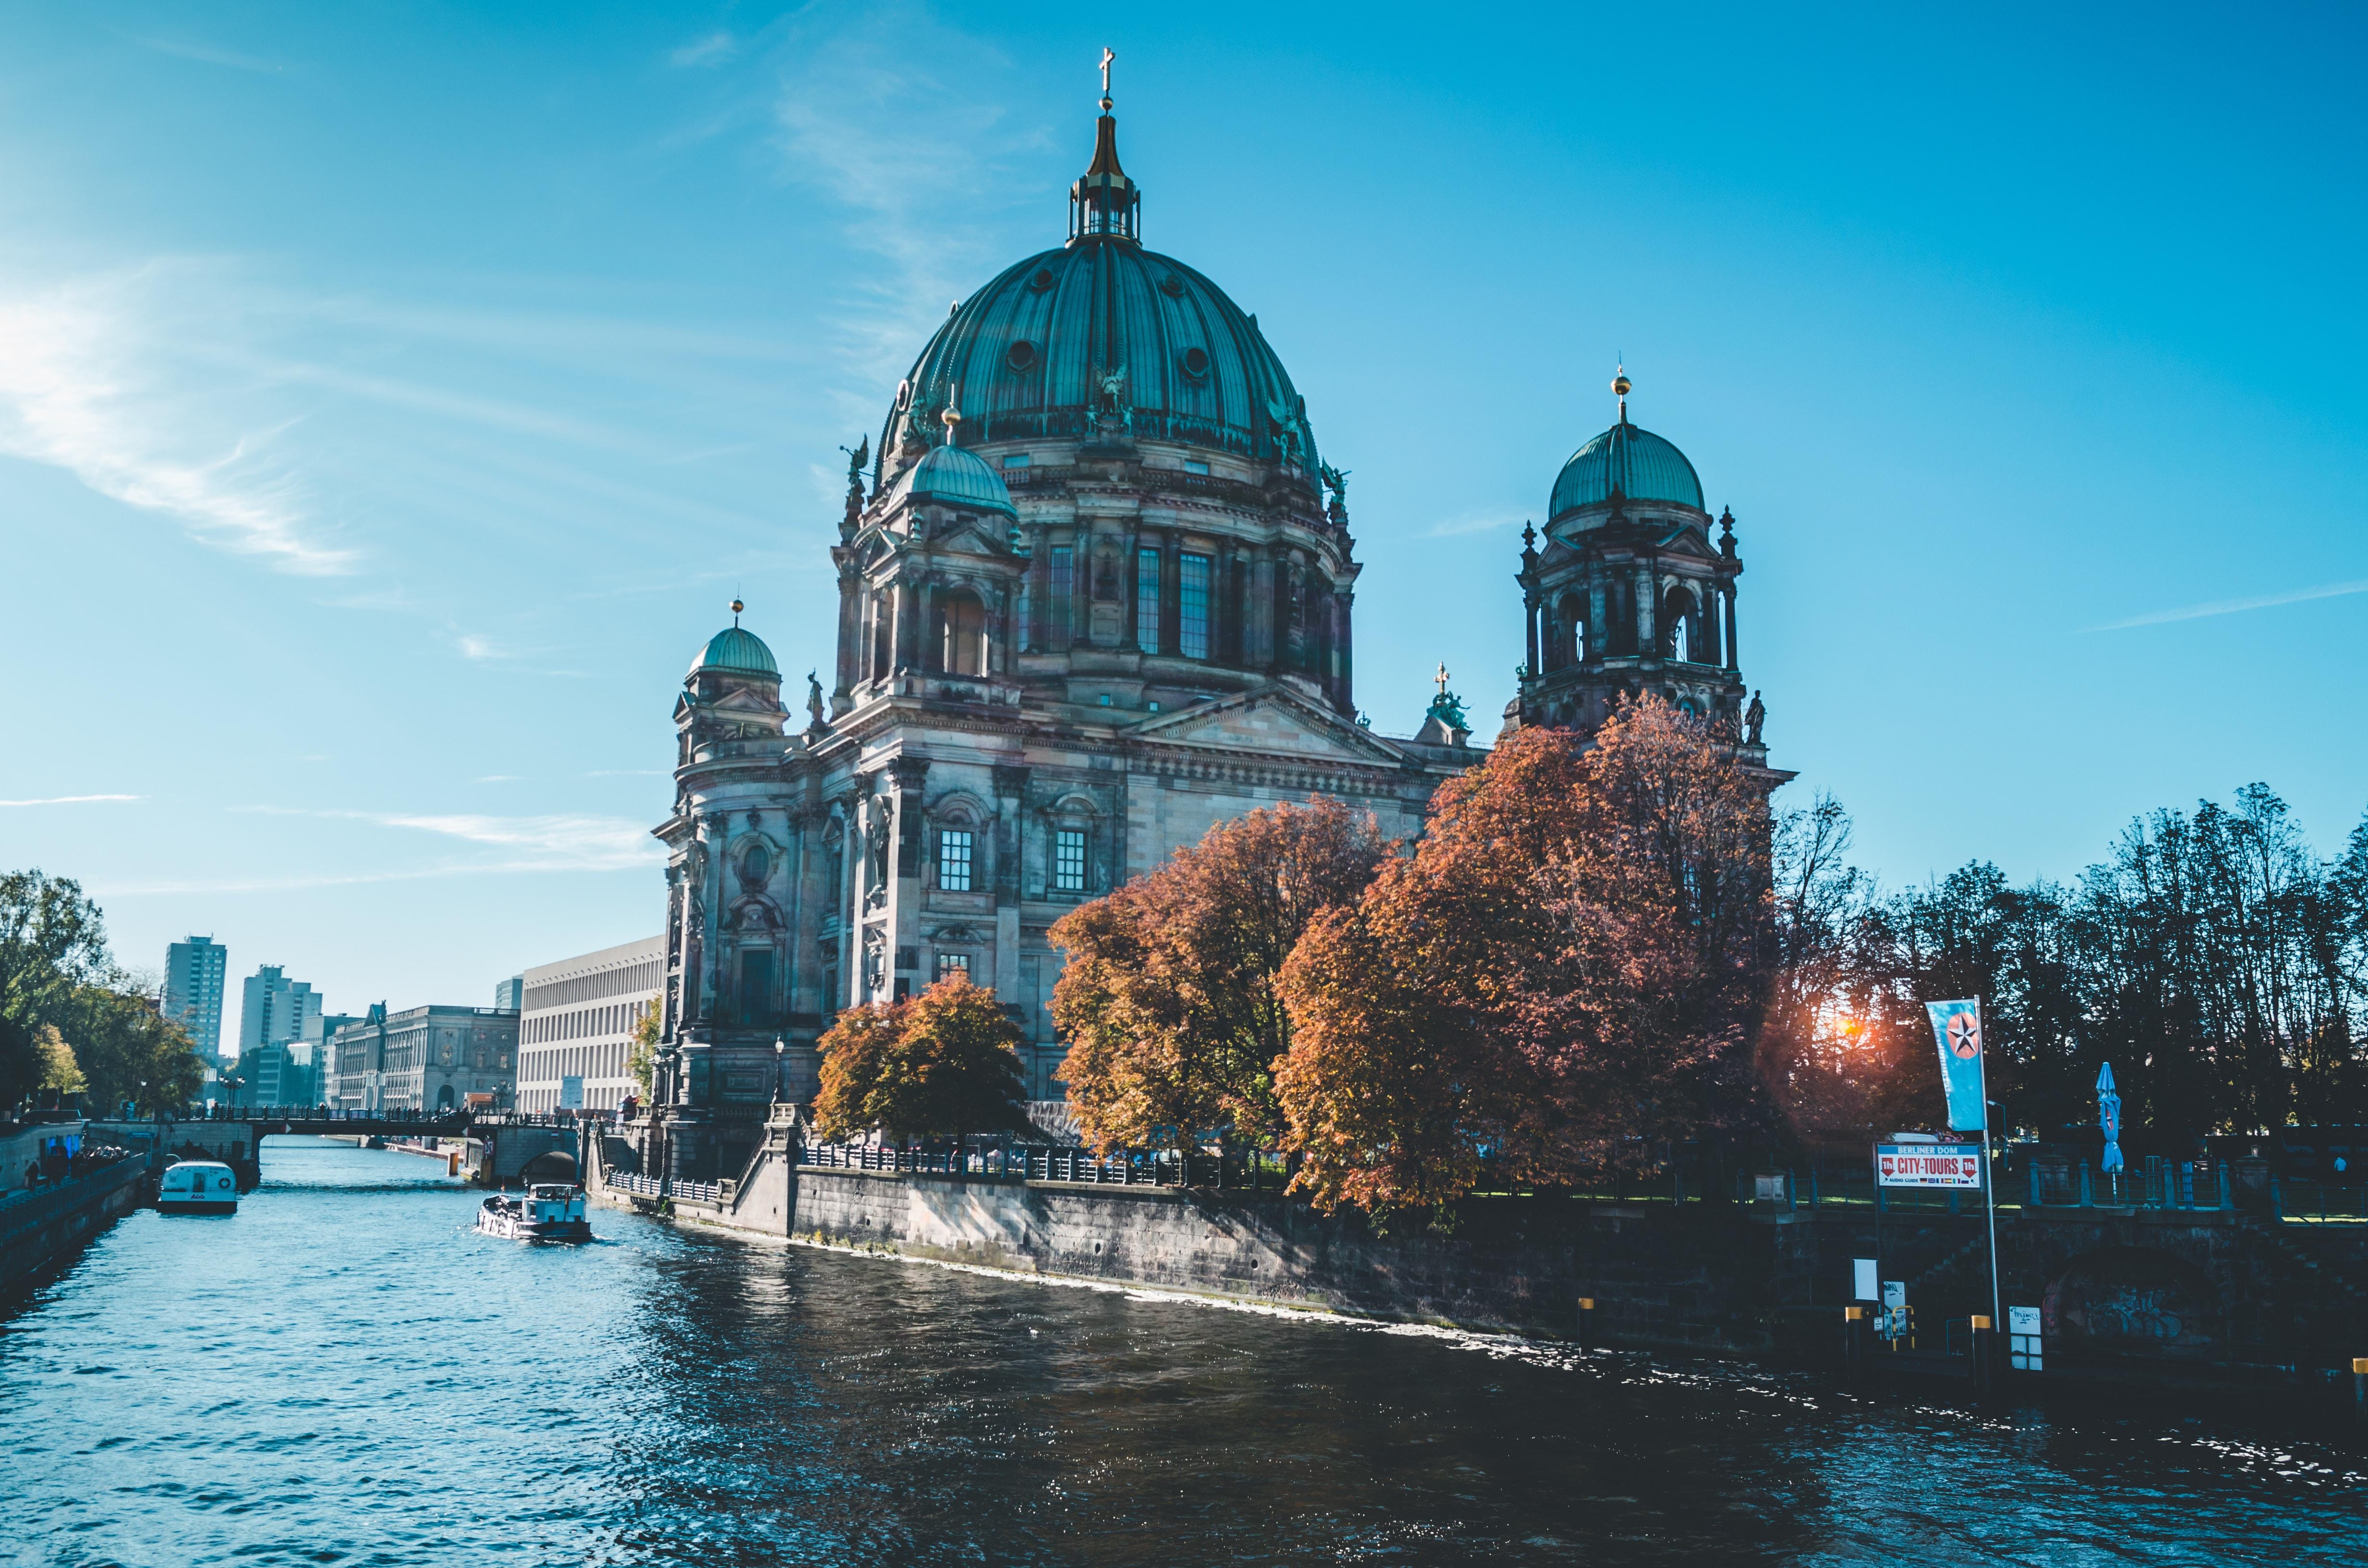 Berlin cruise